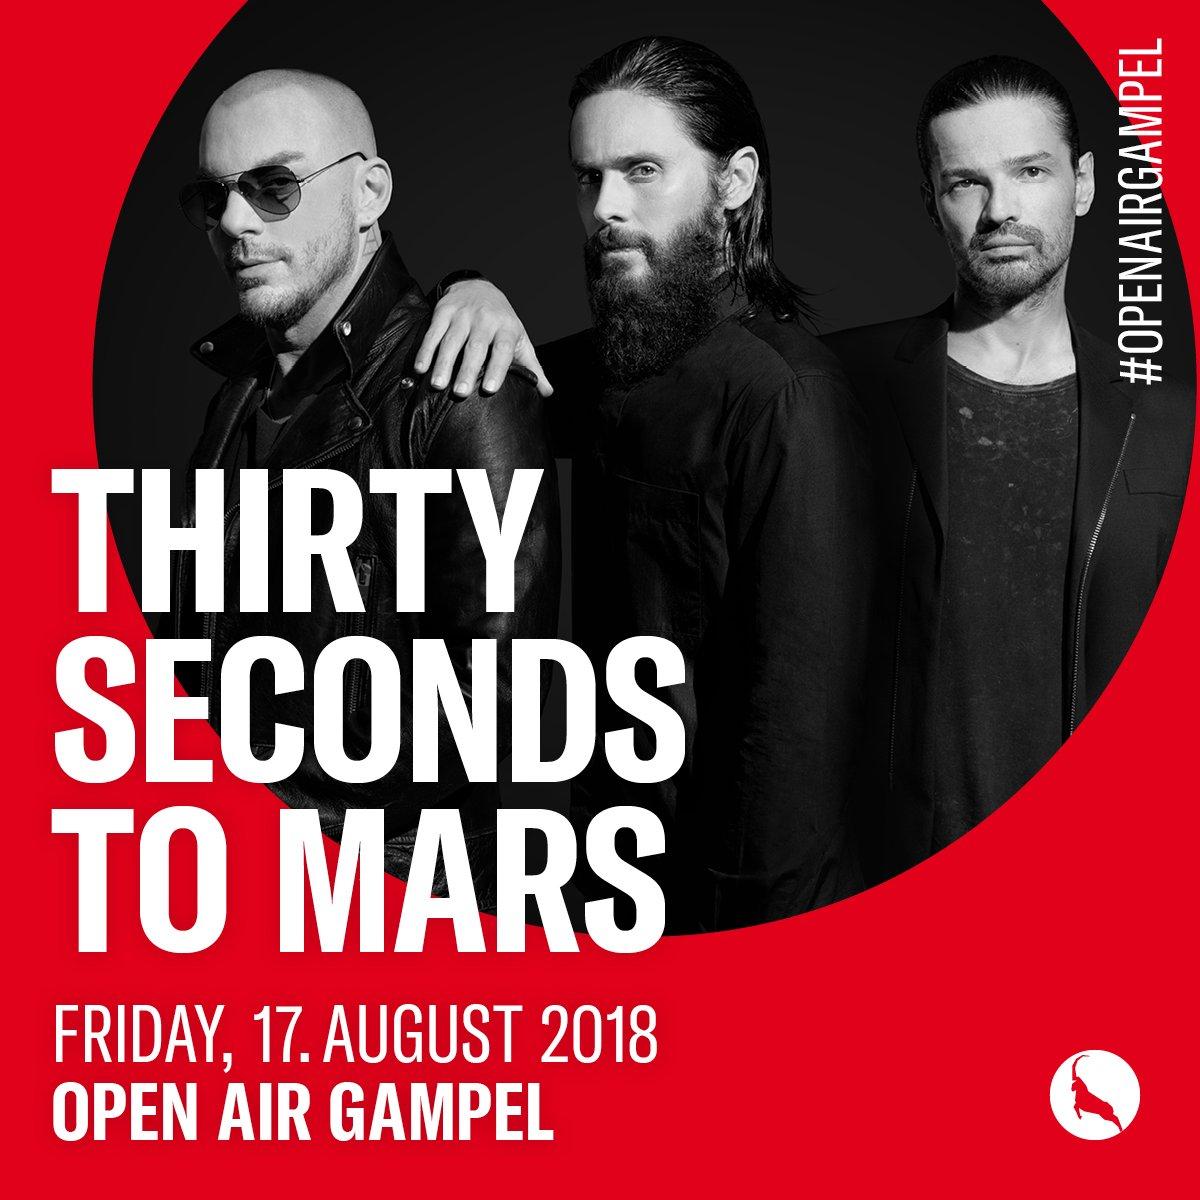 MARS IS COMING AUG 17 // OPEN AIR GAMPEL SWITZERLAND  https://t.co/MDIpvVmSBY  #OpenAirGampel #MonolithTour https://t.co/8ZOc1Zjzki